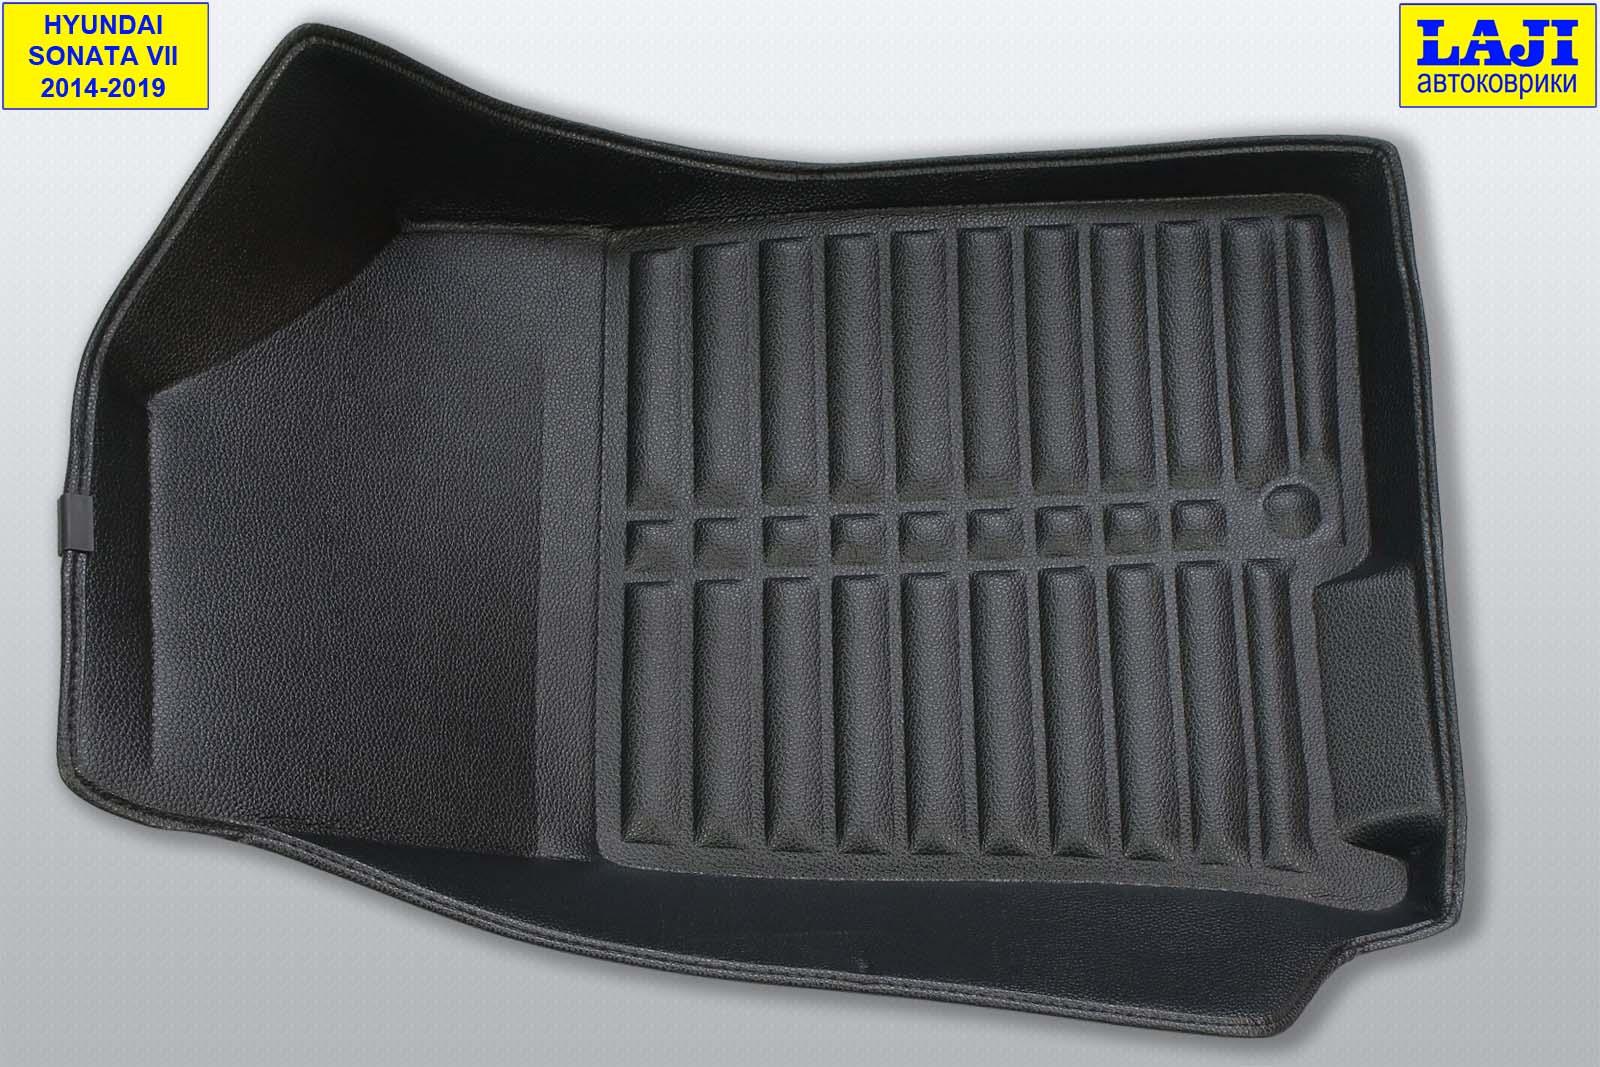 5D коврики в салон Hyundai Sonata 7 2014-2019 4